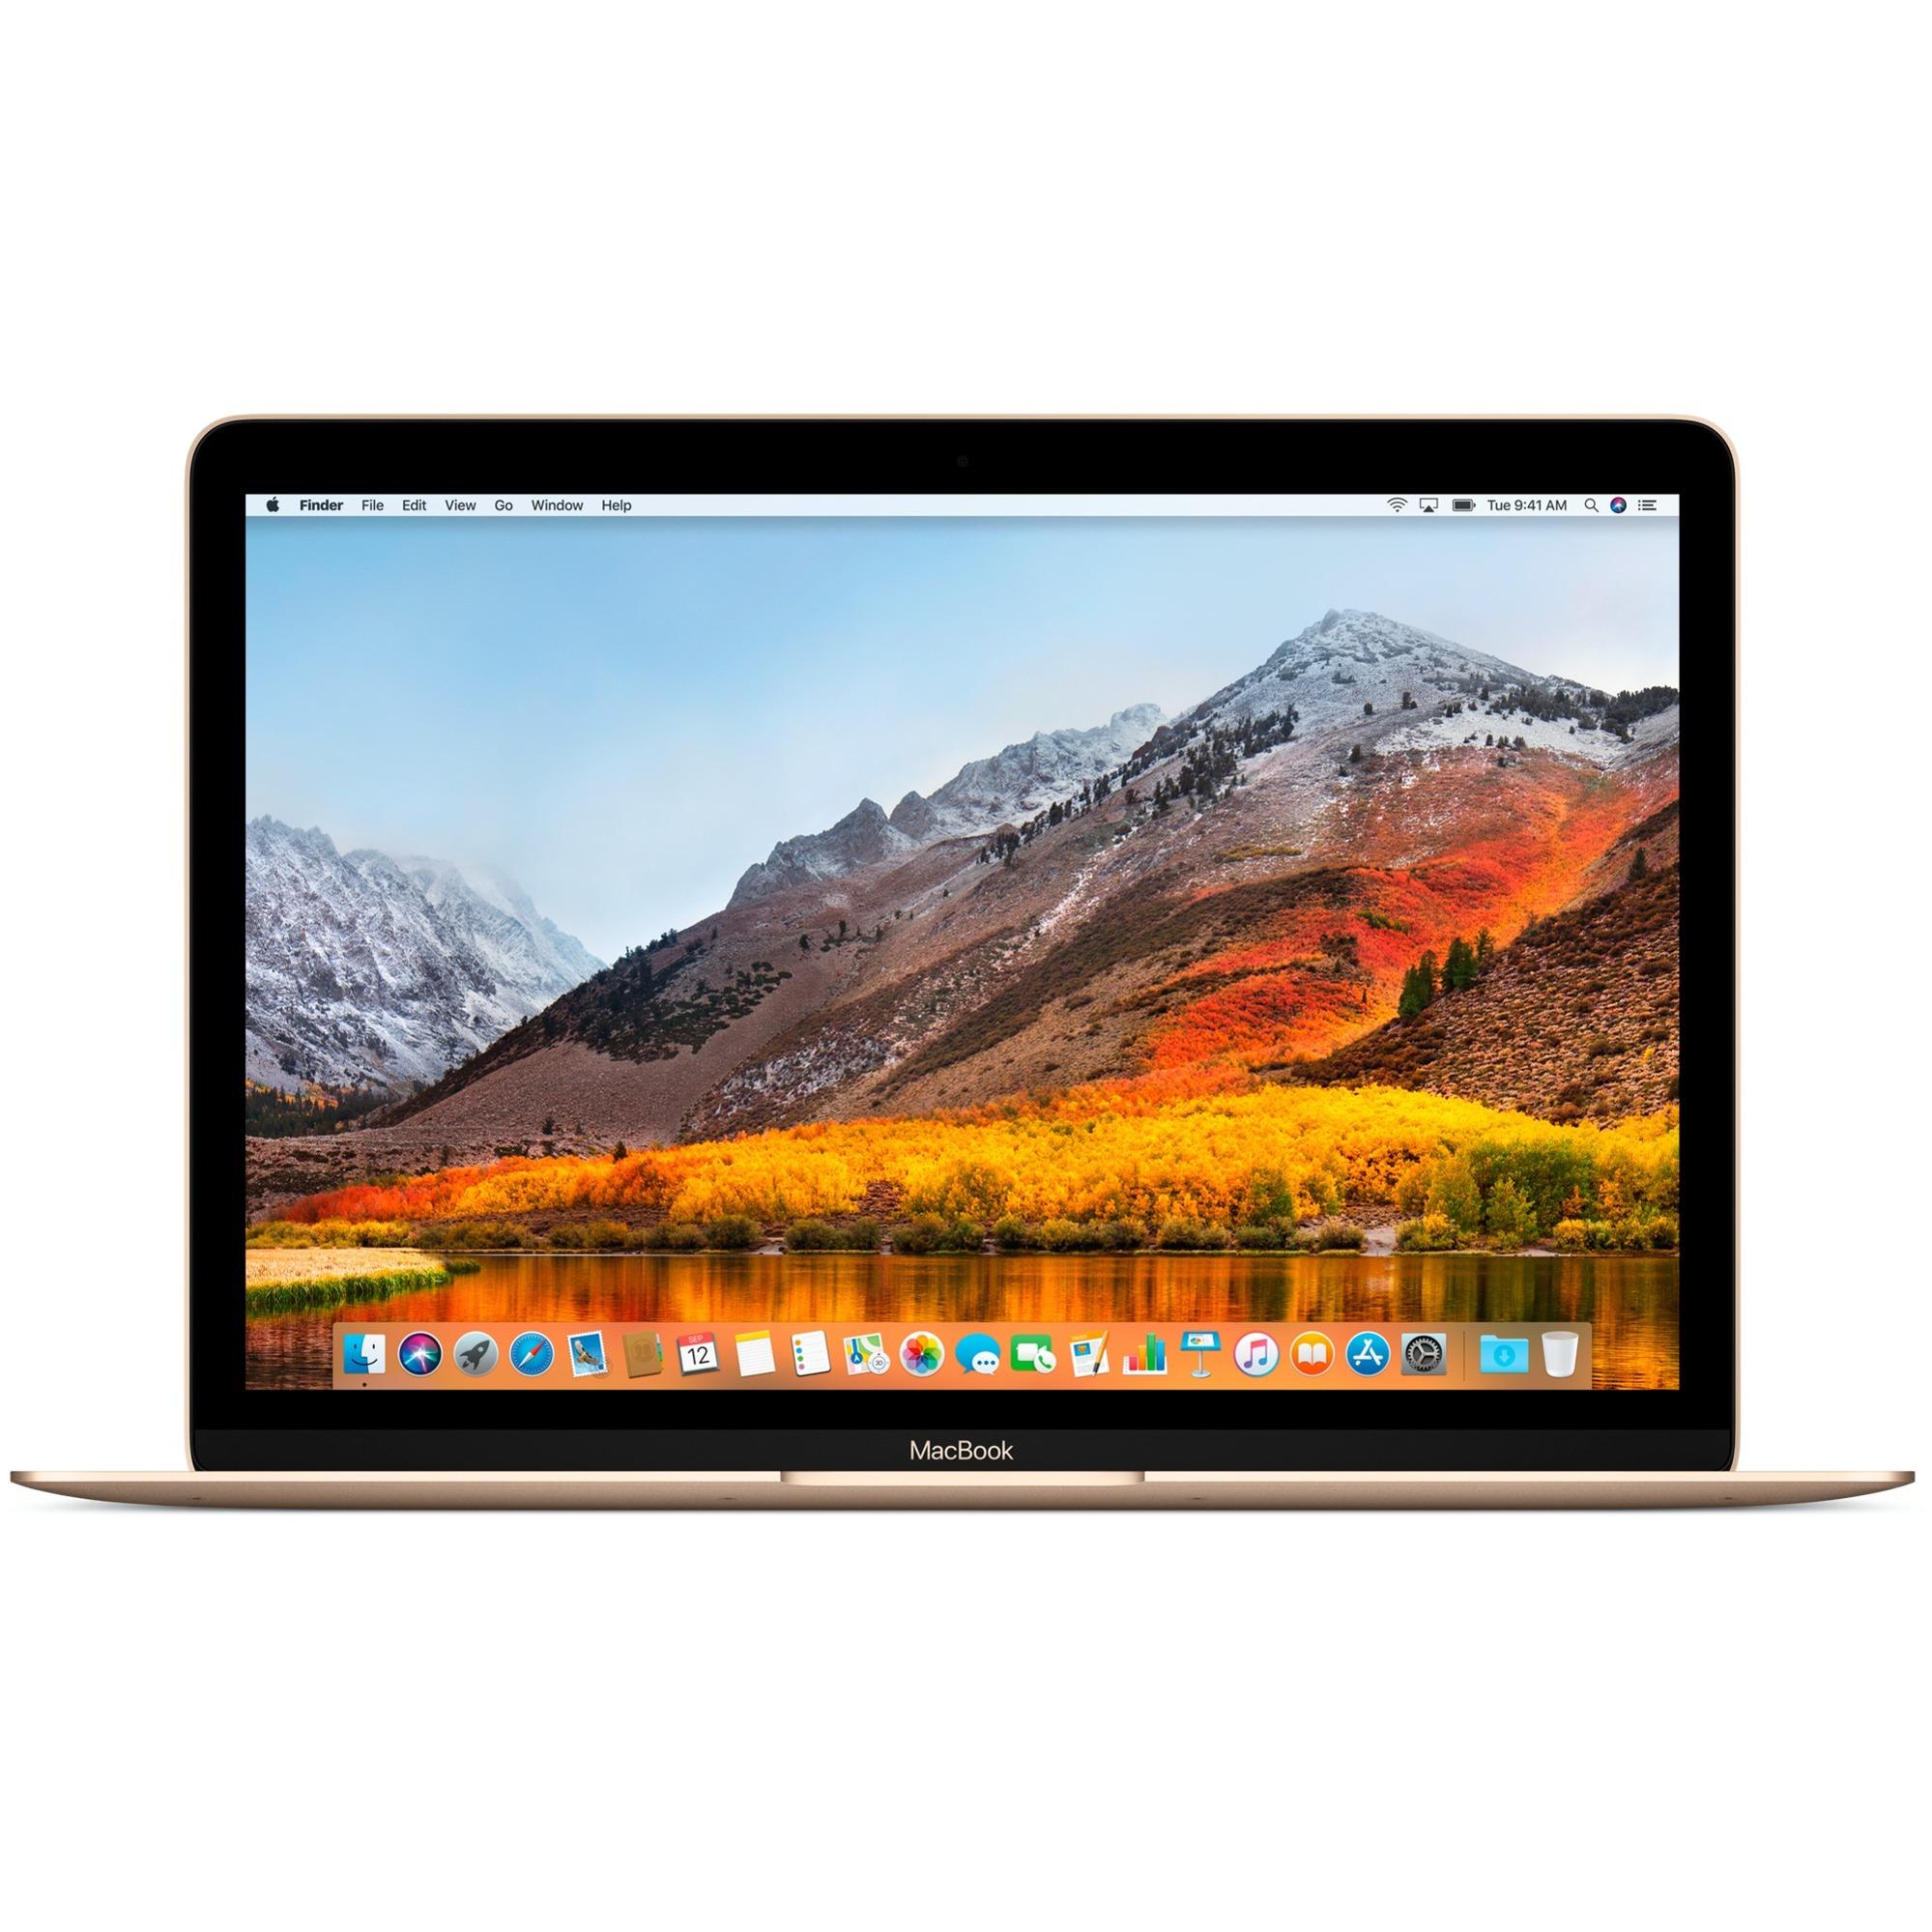 MacBook 1.2GHz 12